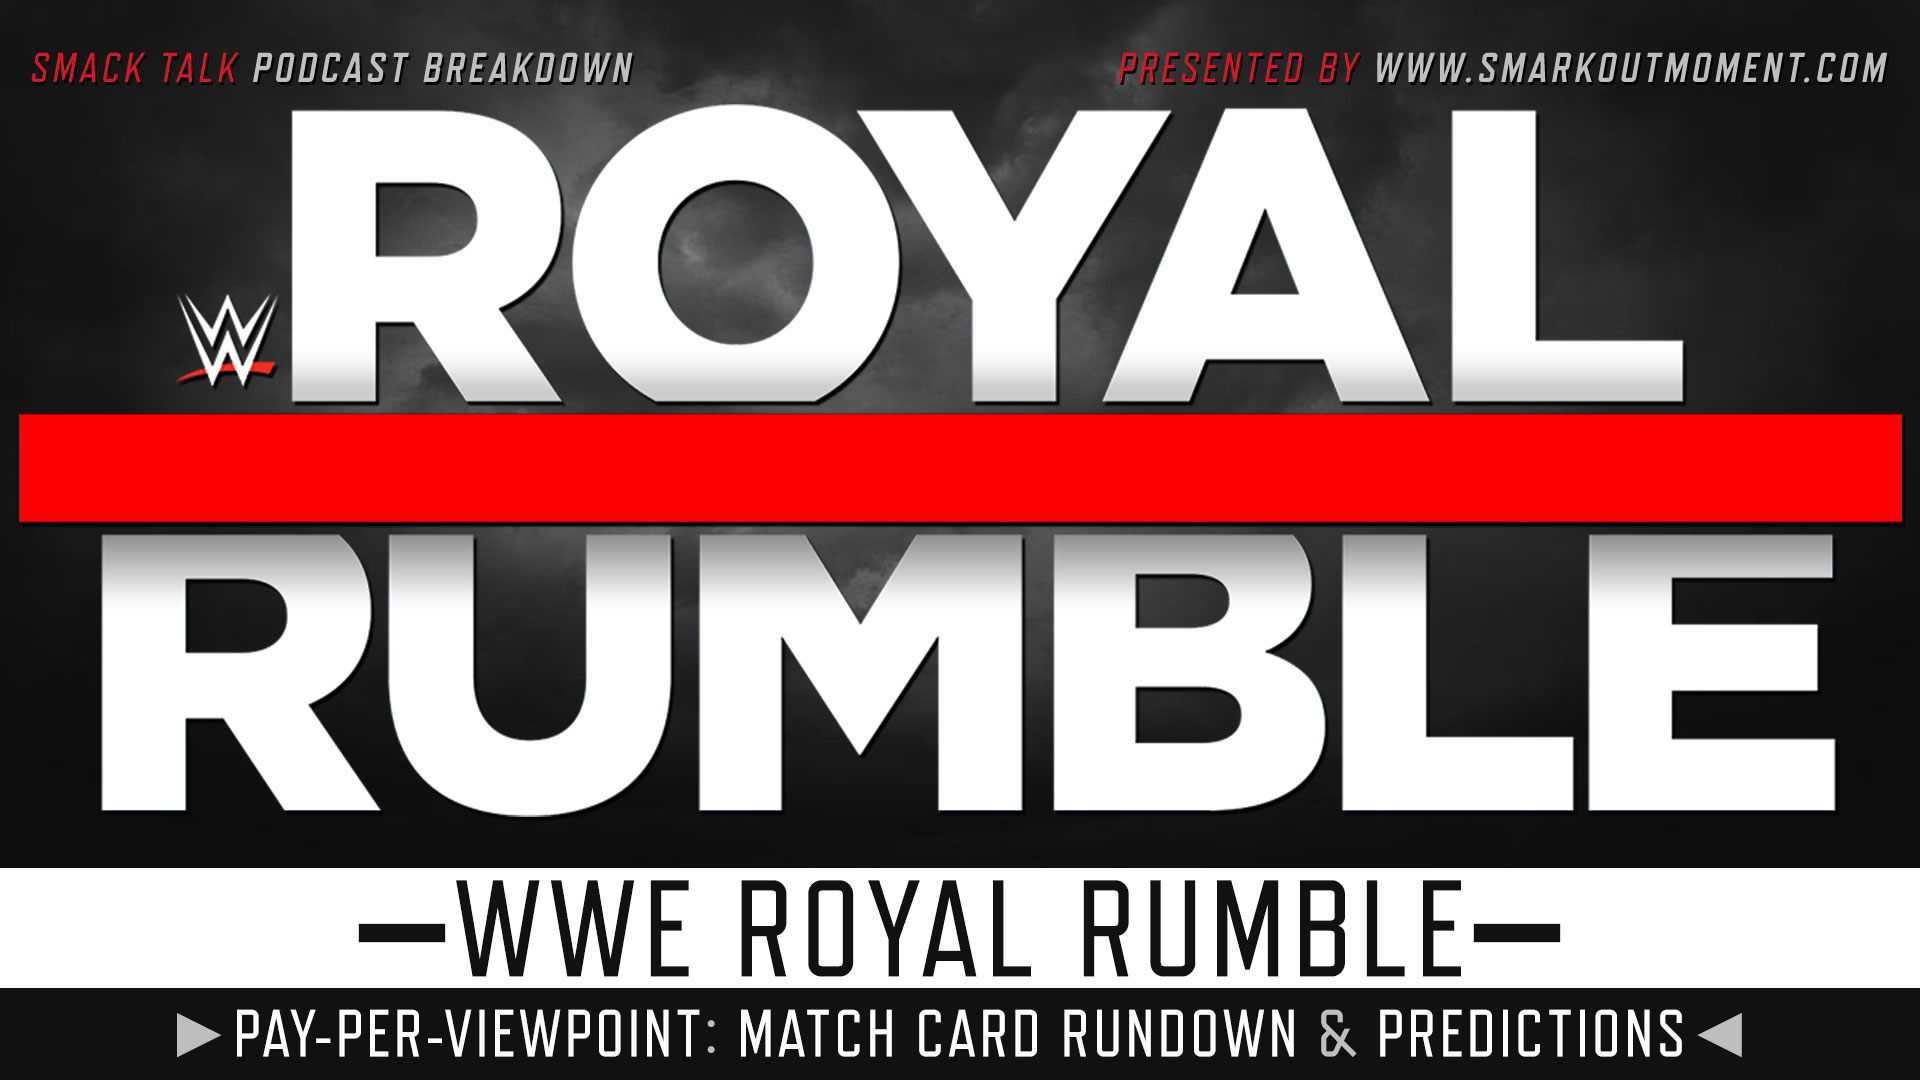 WWE Royal Rumble 2021 spoilers podcast